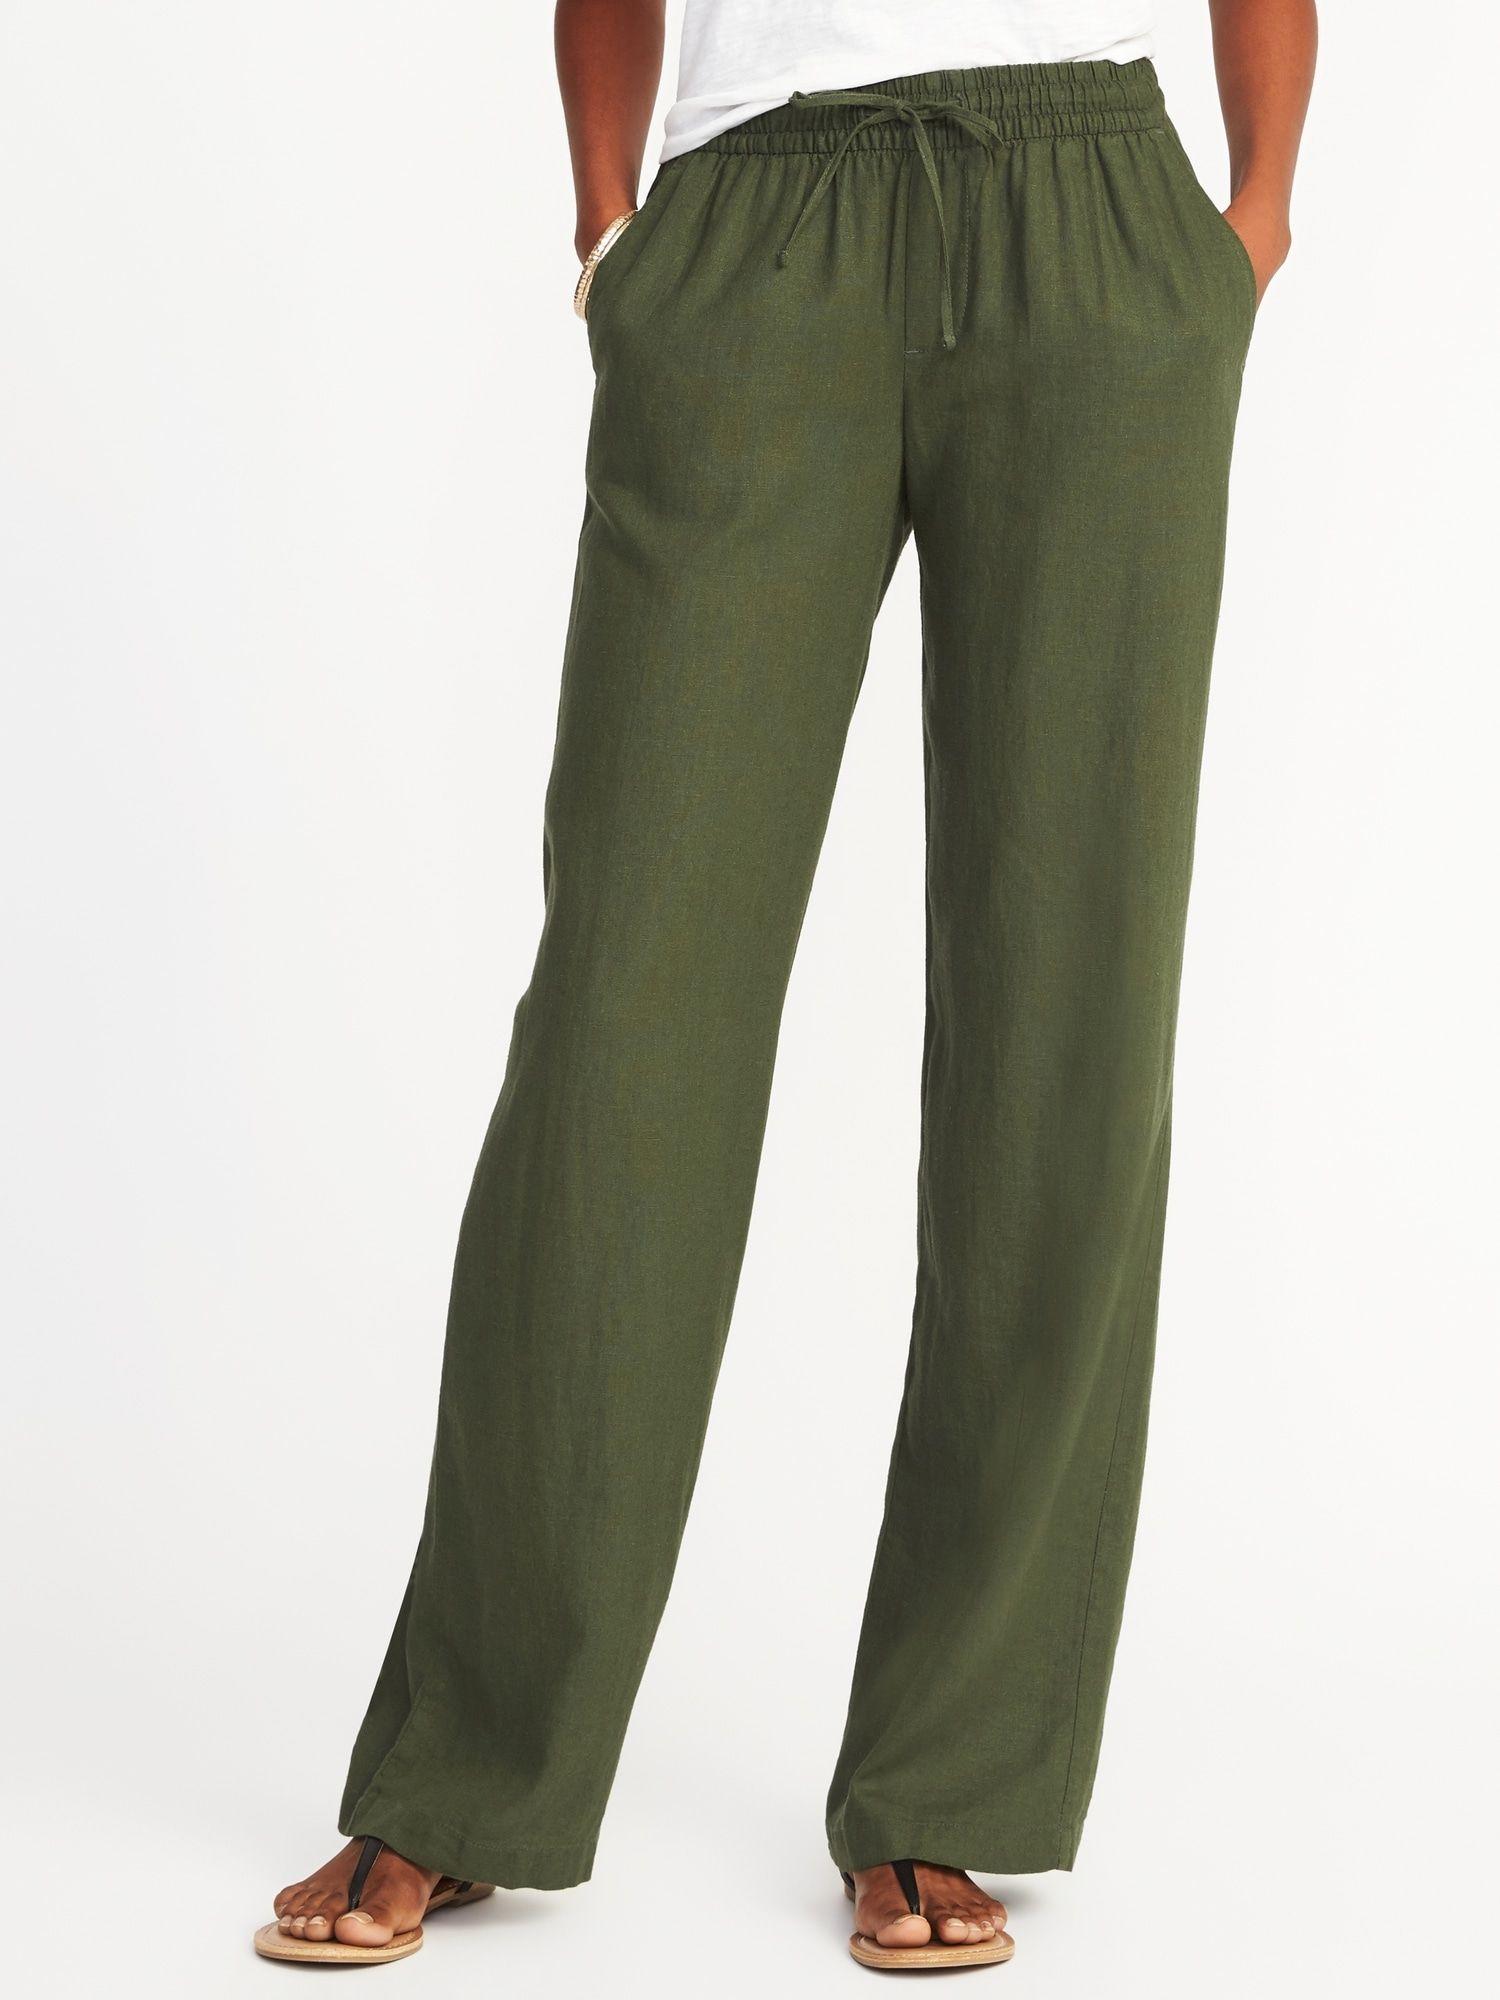 Old Navy Women/'s Black Linen Blend Pants Size S Petite